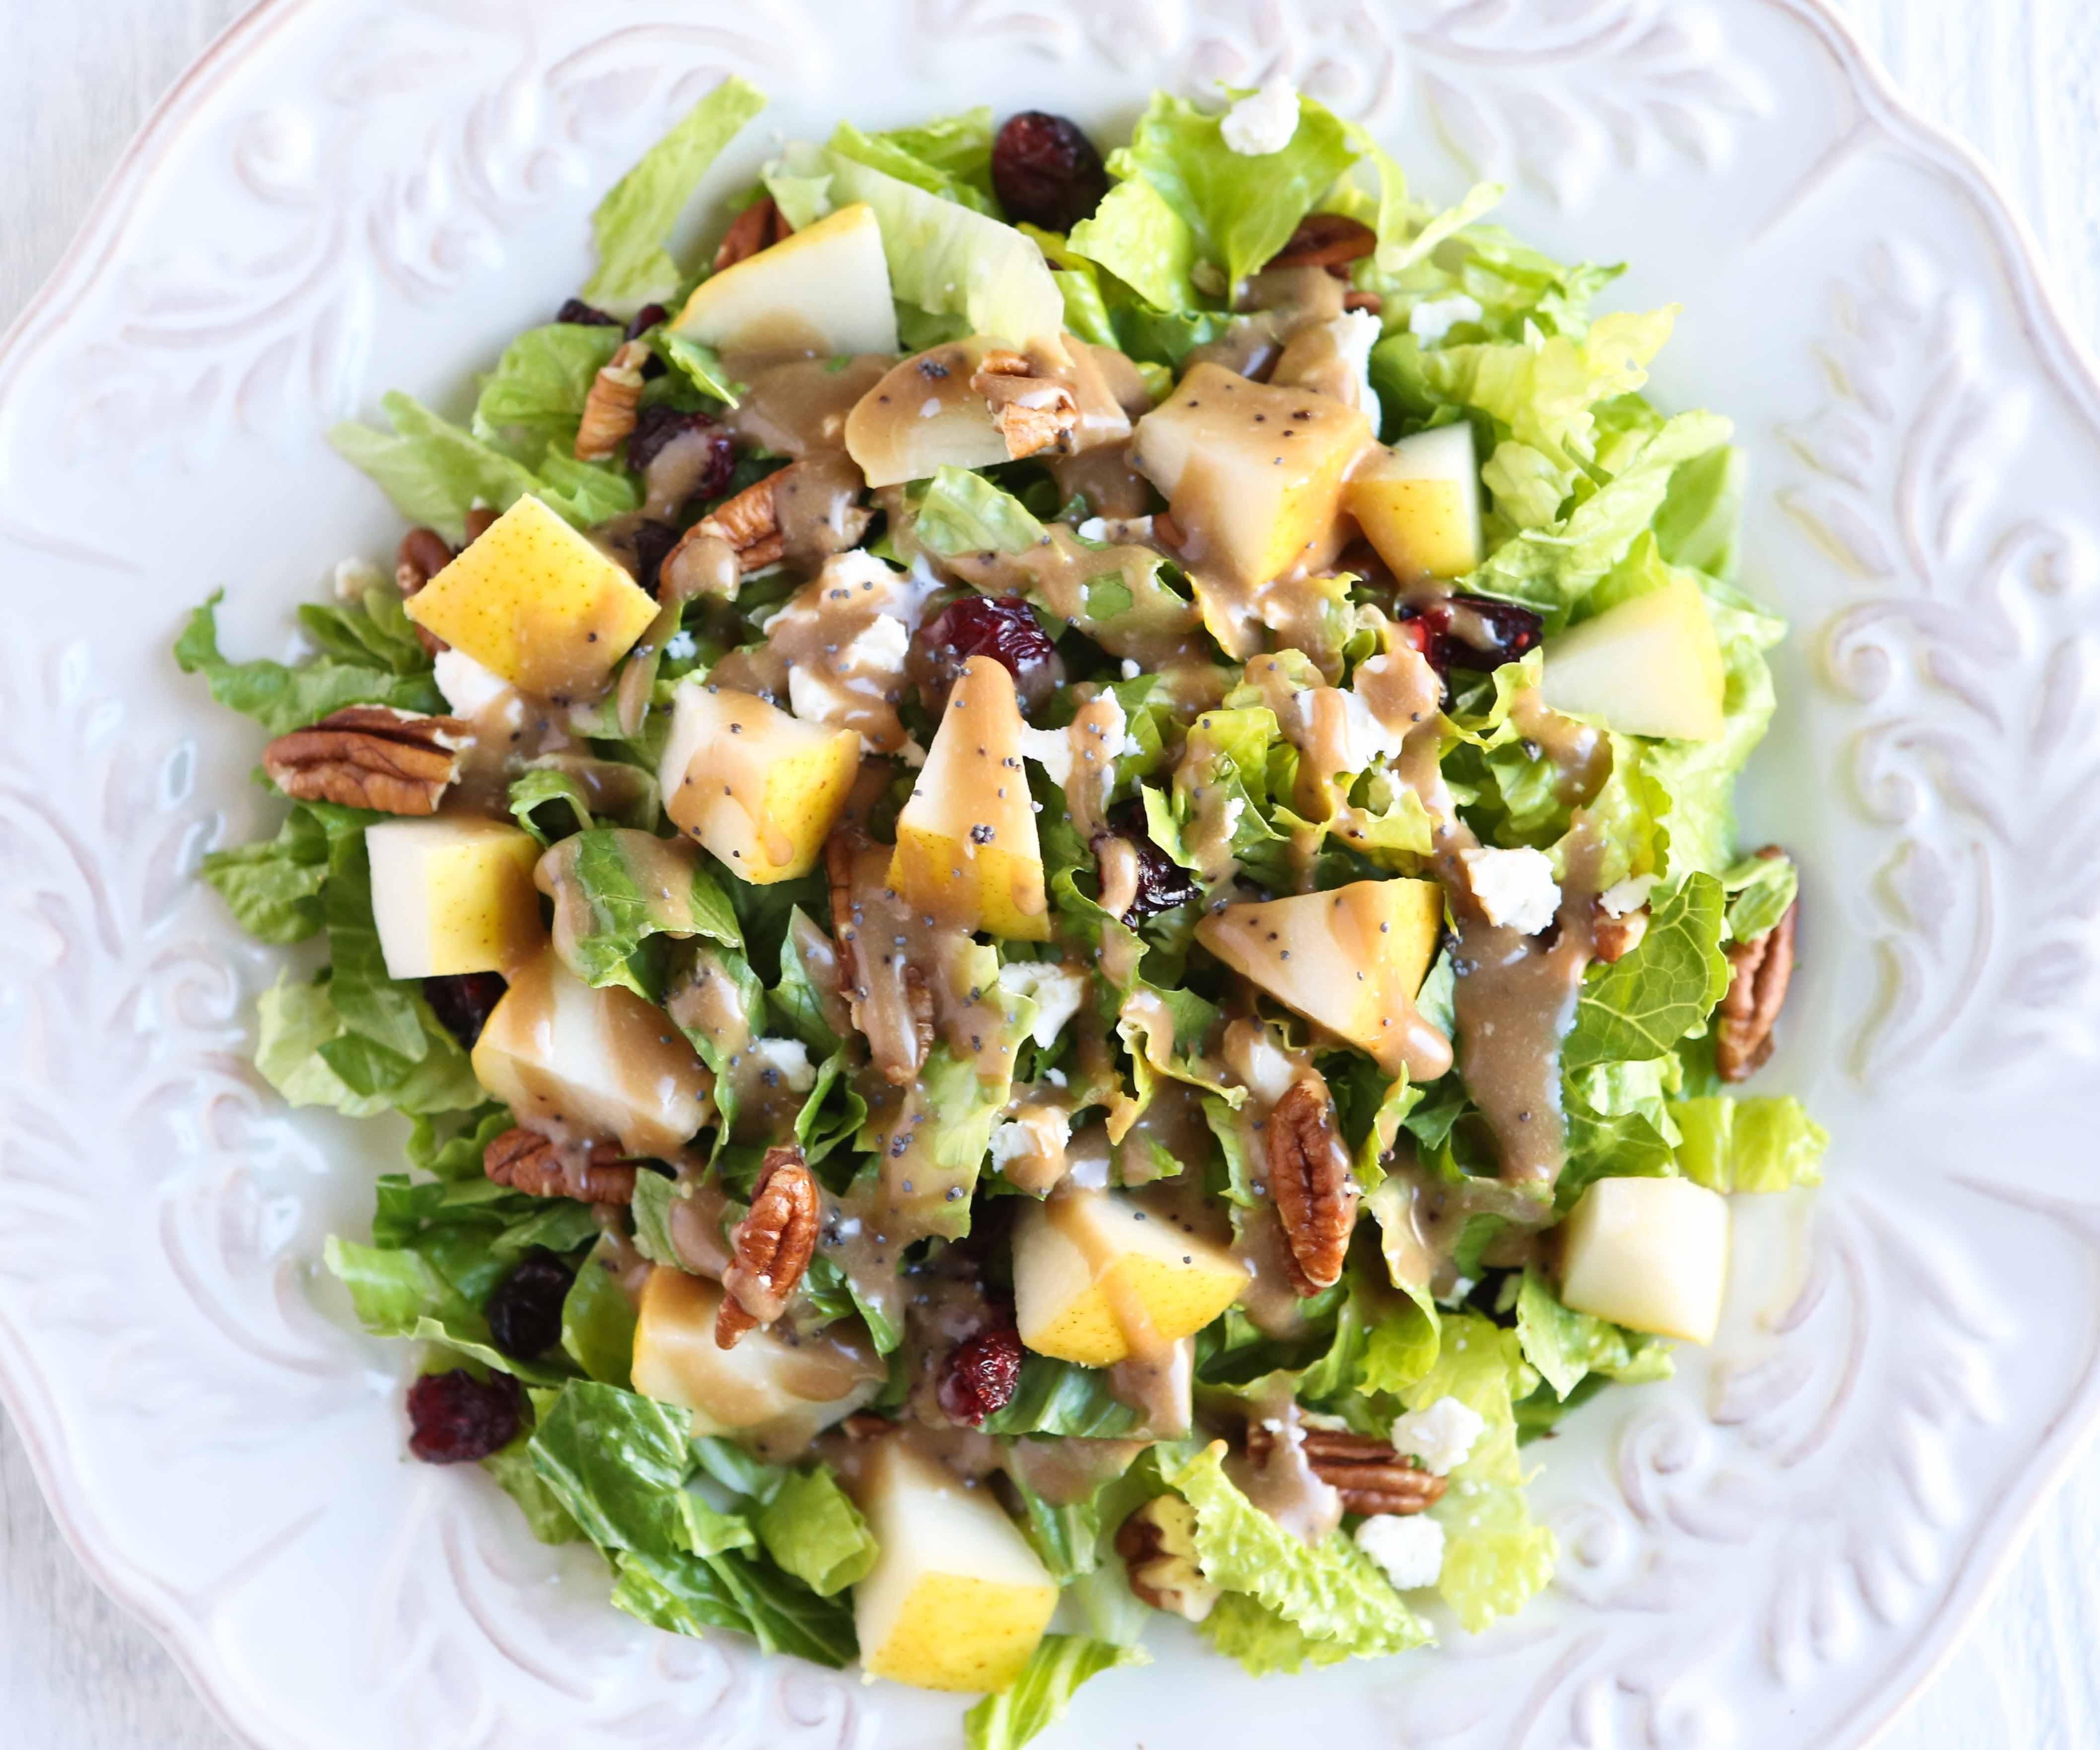 Homemade Autumn Salad